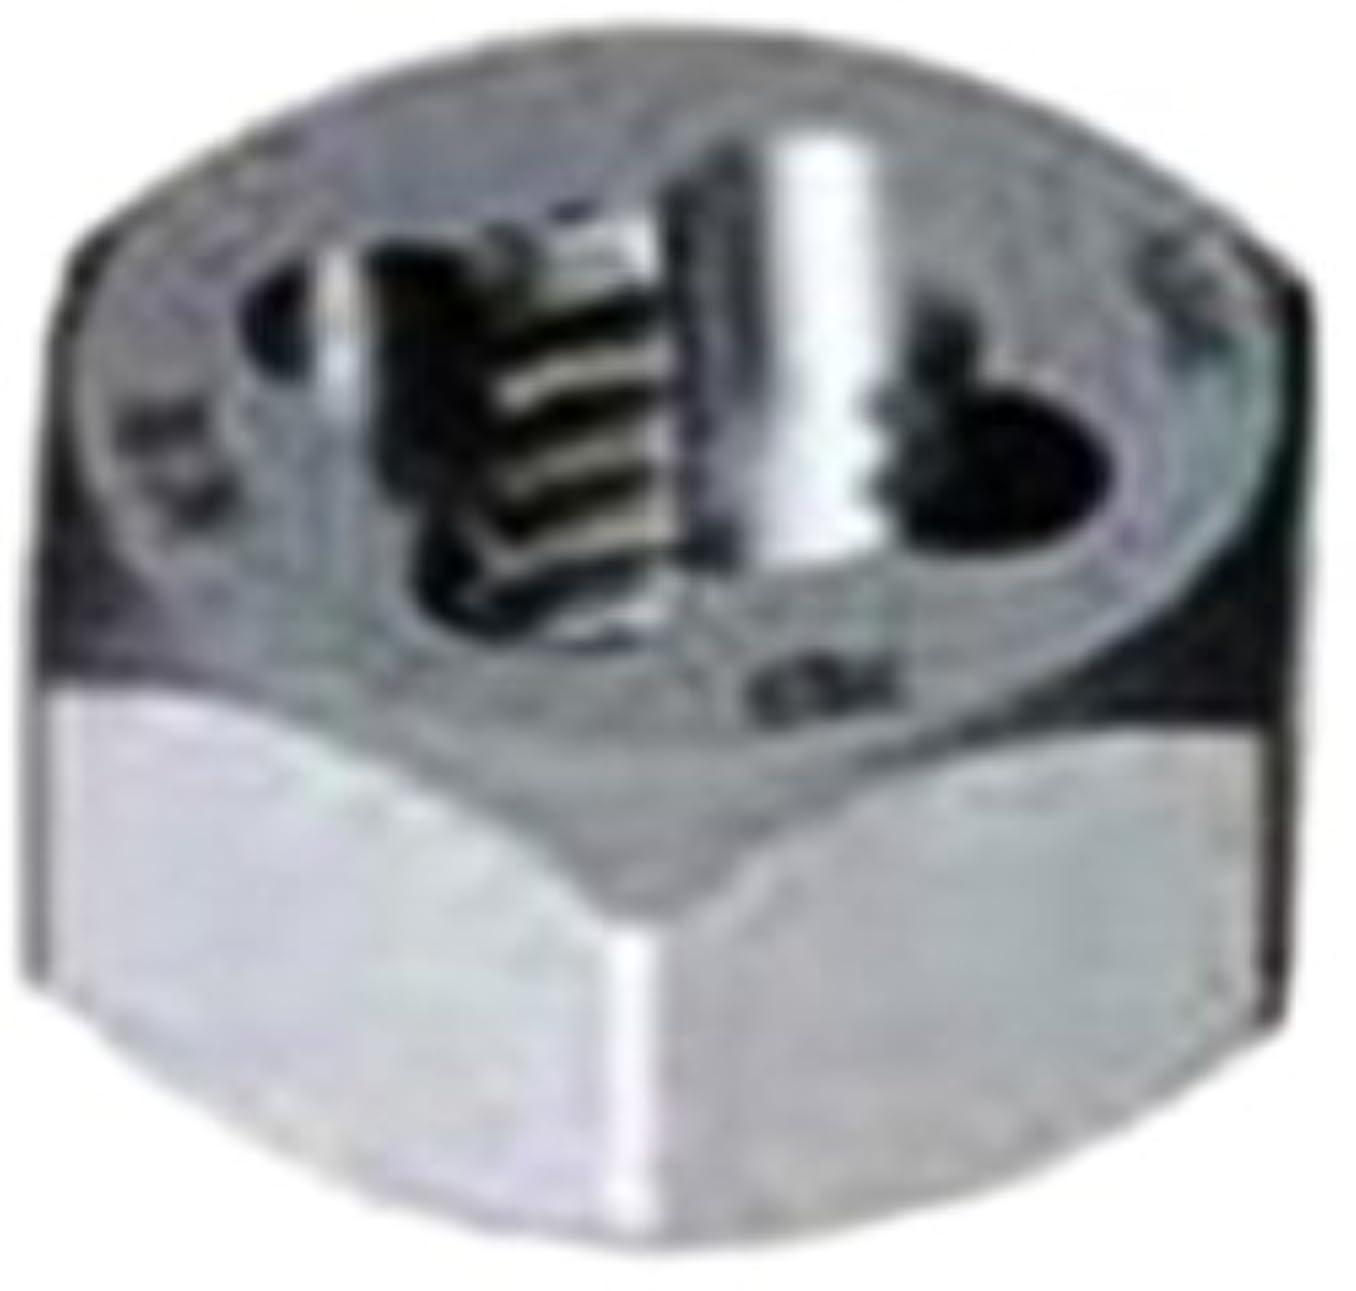 Gyros 92-91032 Carbon Steel Hex Rethreading Die, 10-32 TPI